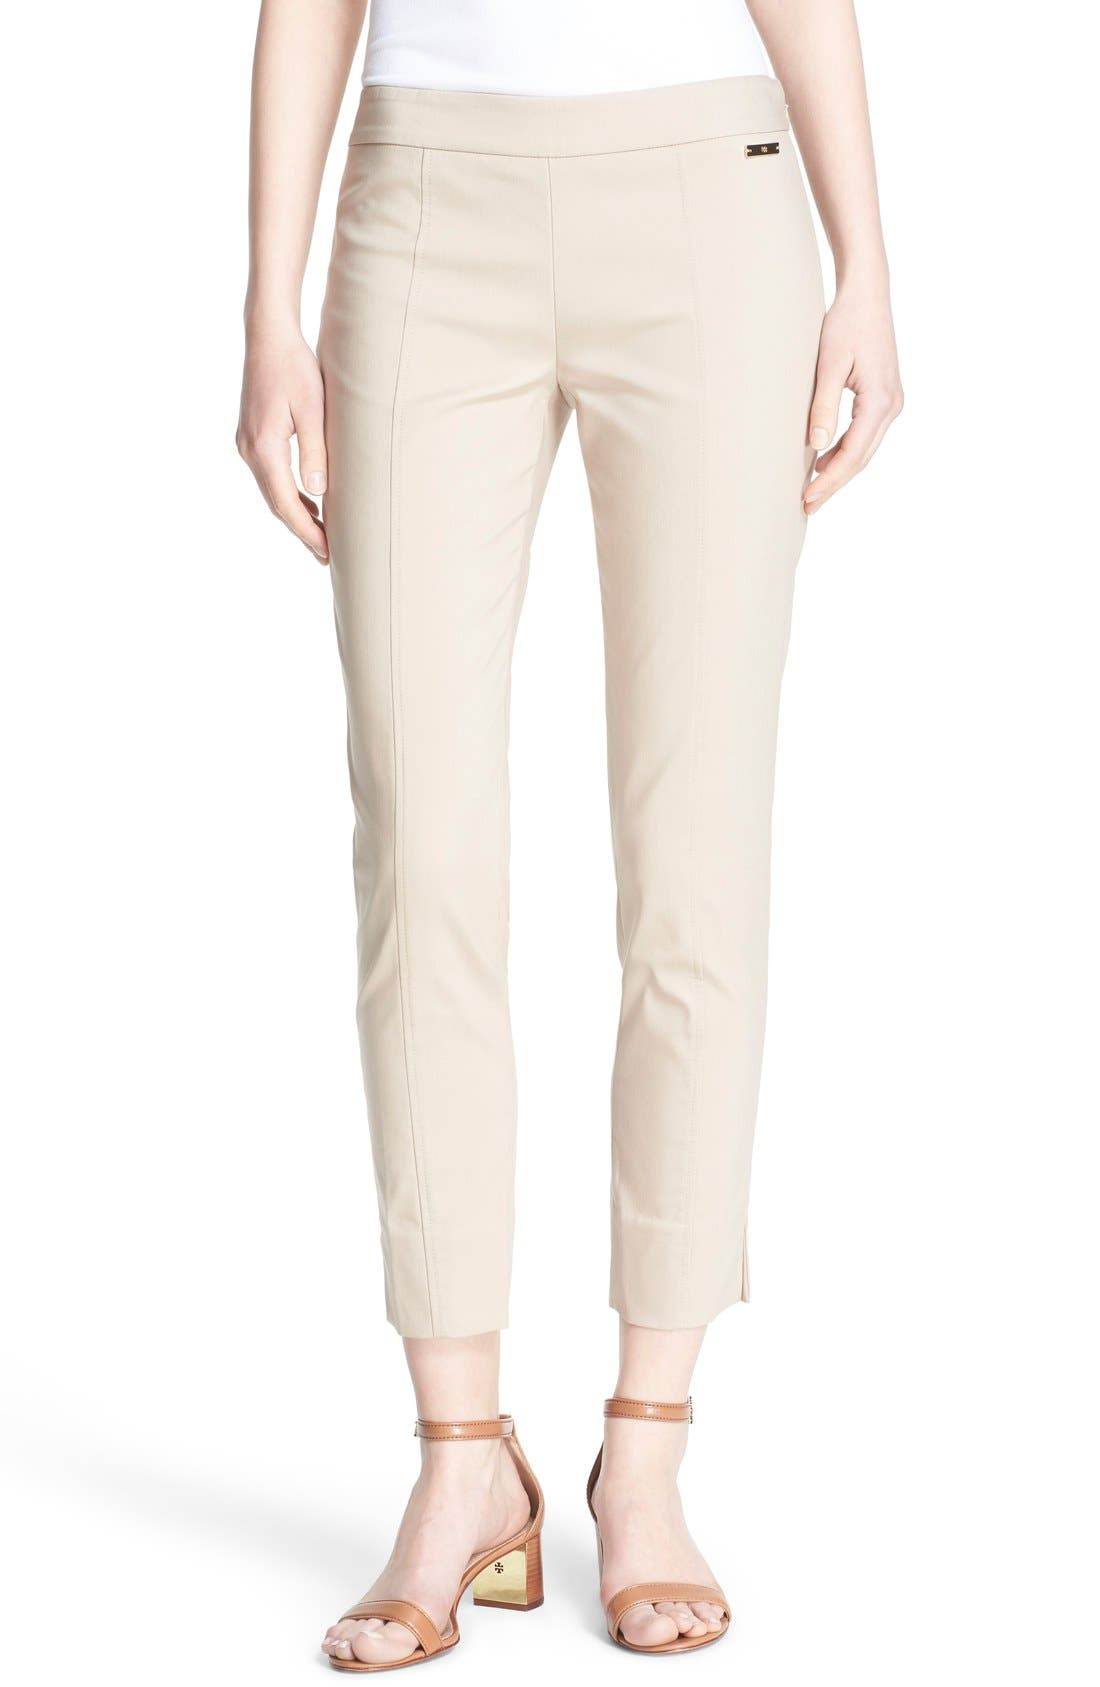 Beige Jeans & Denim for Women: Skinny, Boyfriend & More | Nordstrom